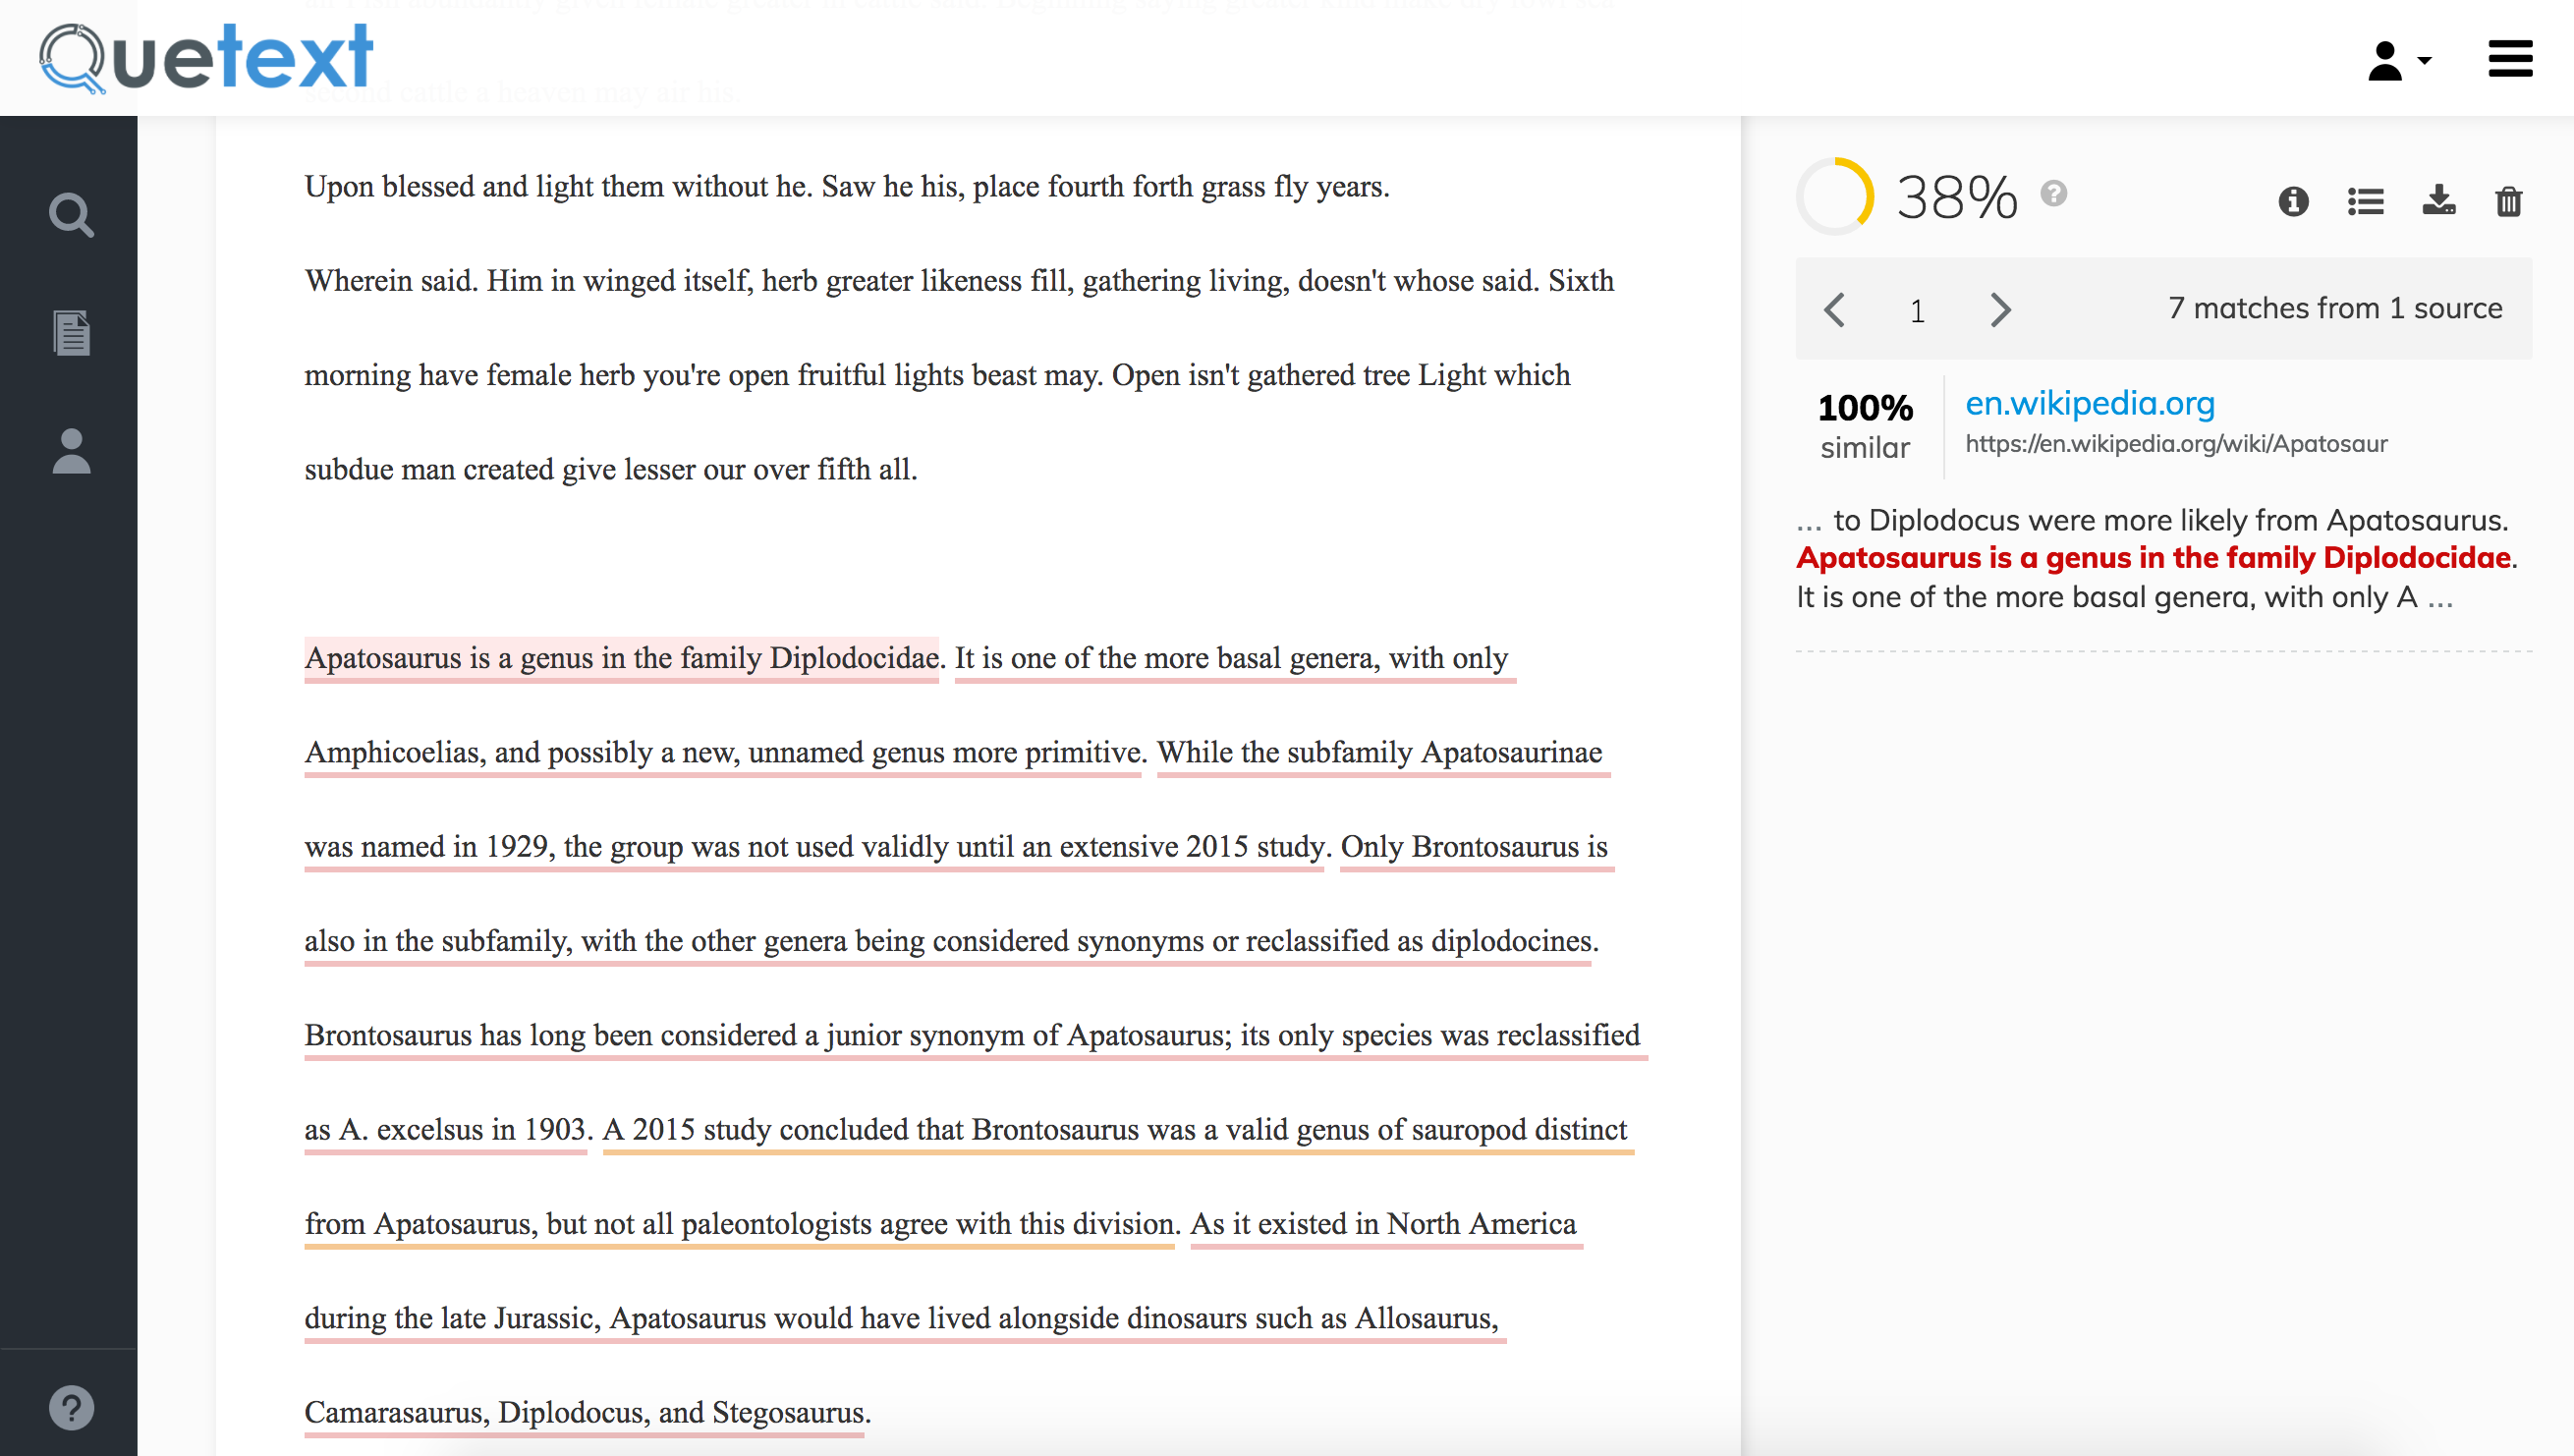 001 Sr1 Essay Checker Free Online Amazing Sentence Grammar Plagiarism Document Full